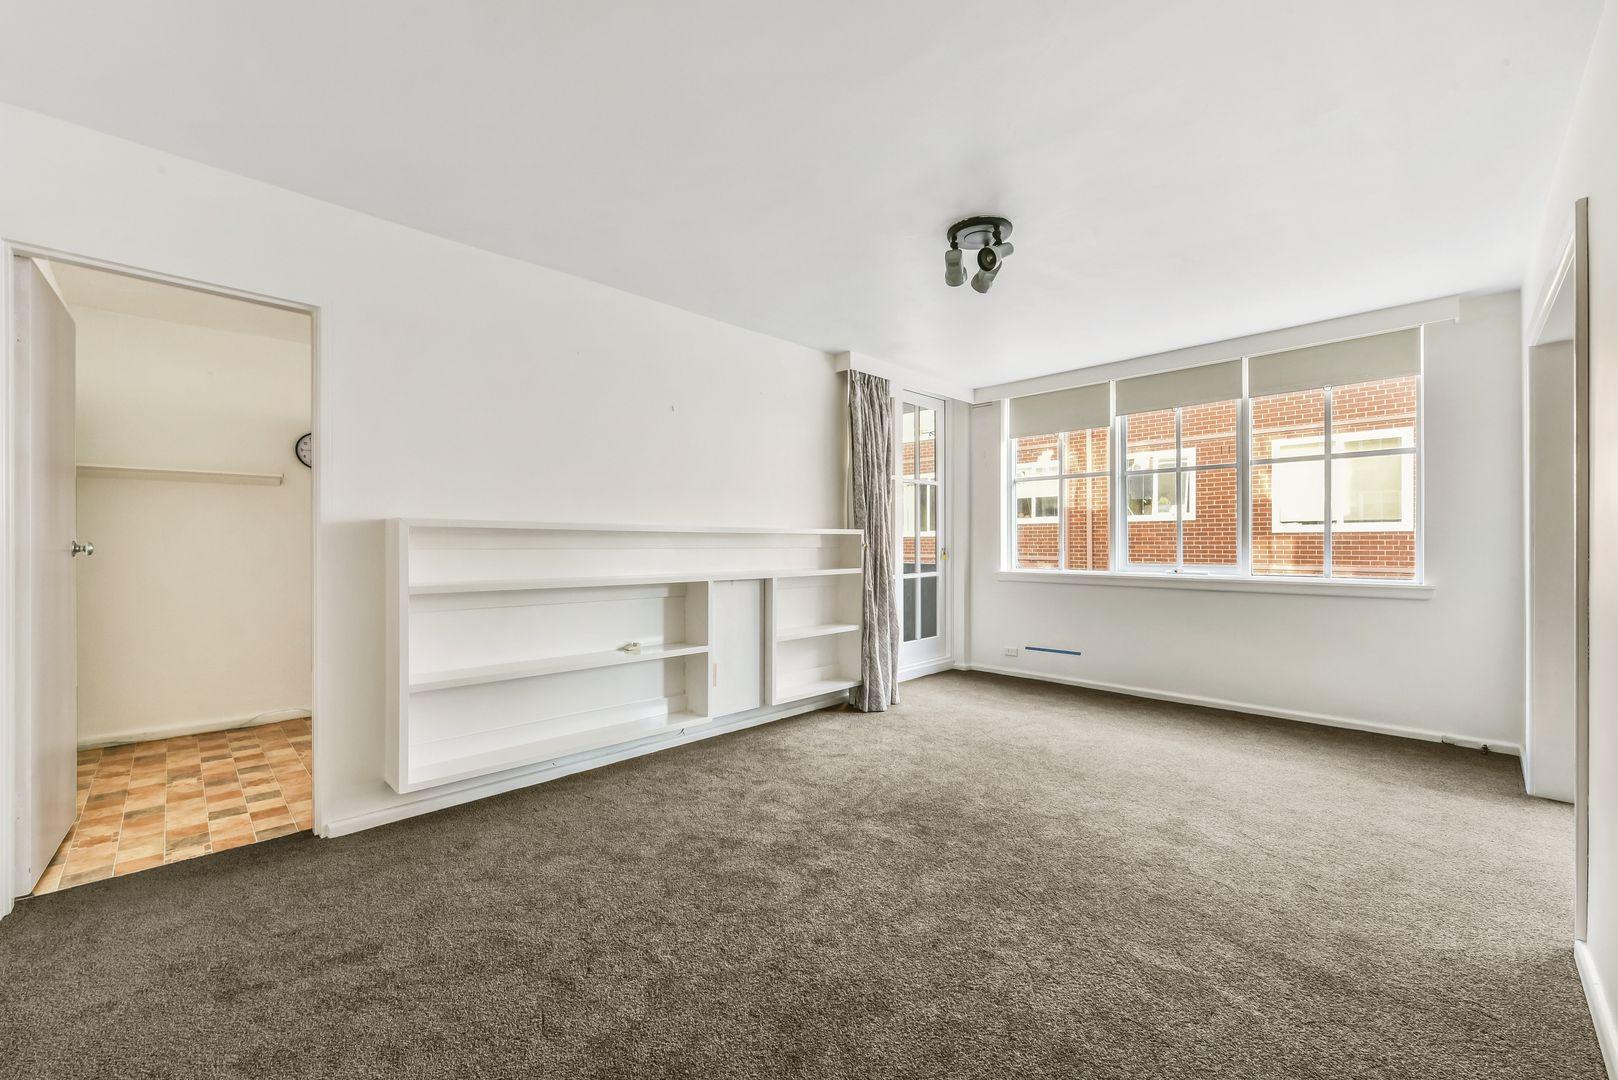 2/21 Powlett Street, East Melbourne VIC 3002, Image 1